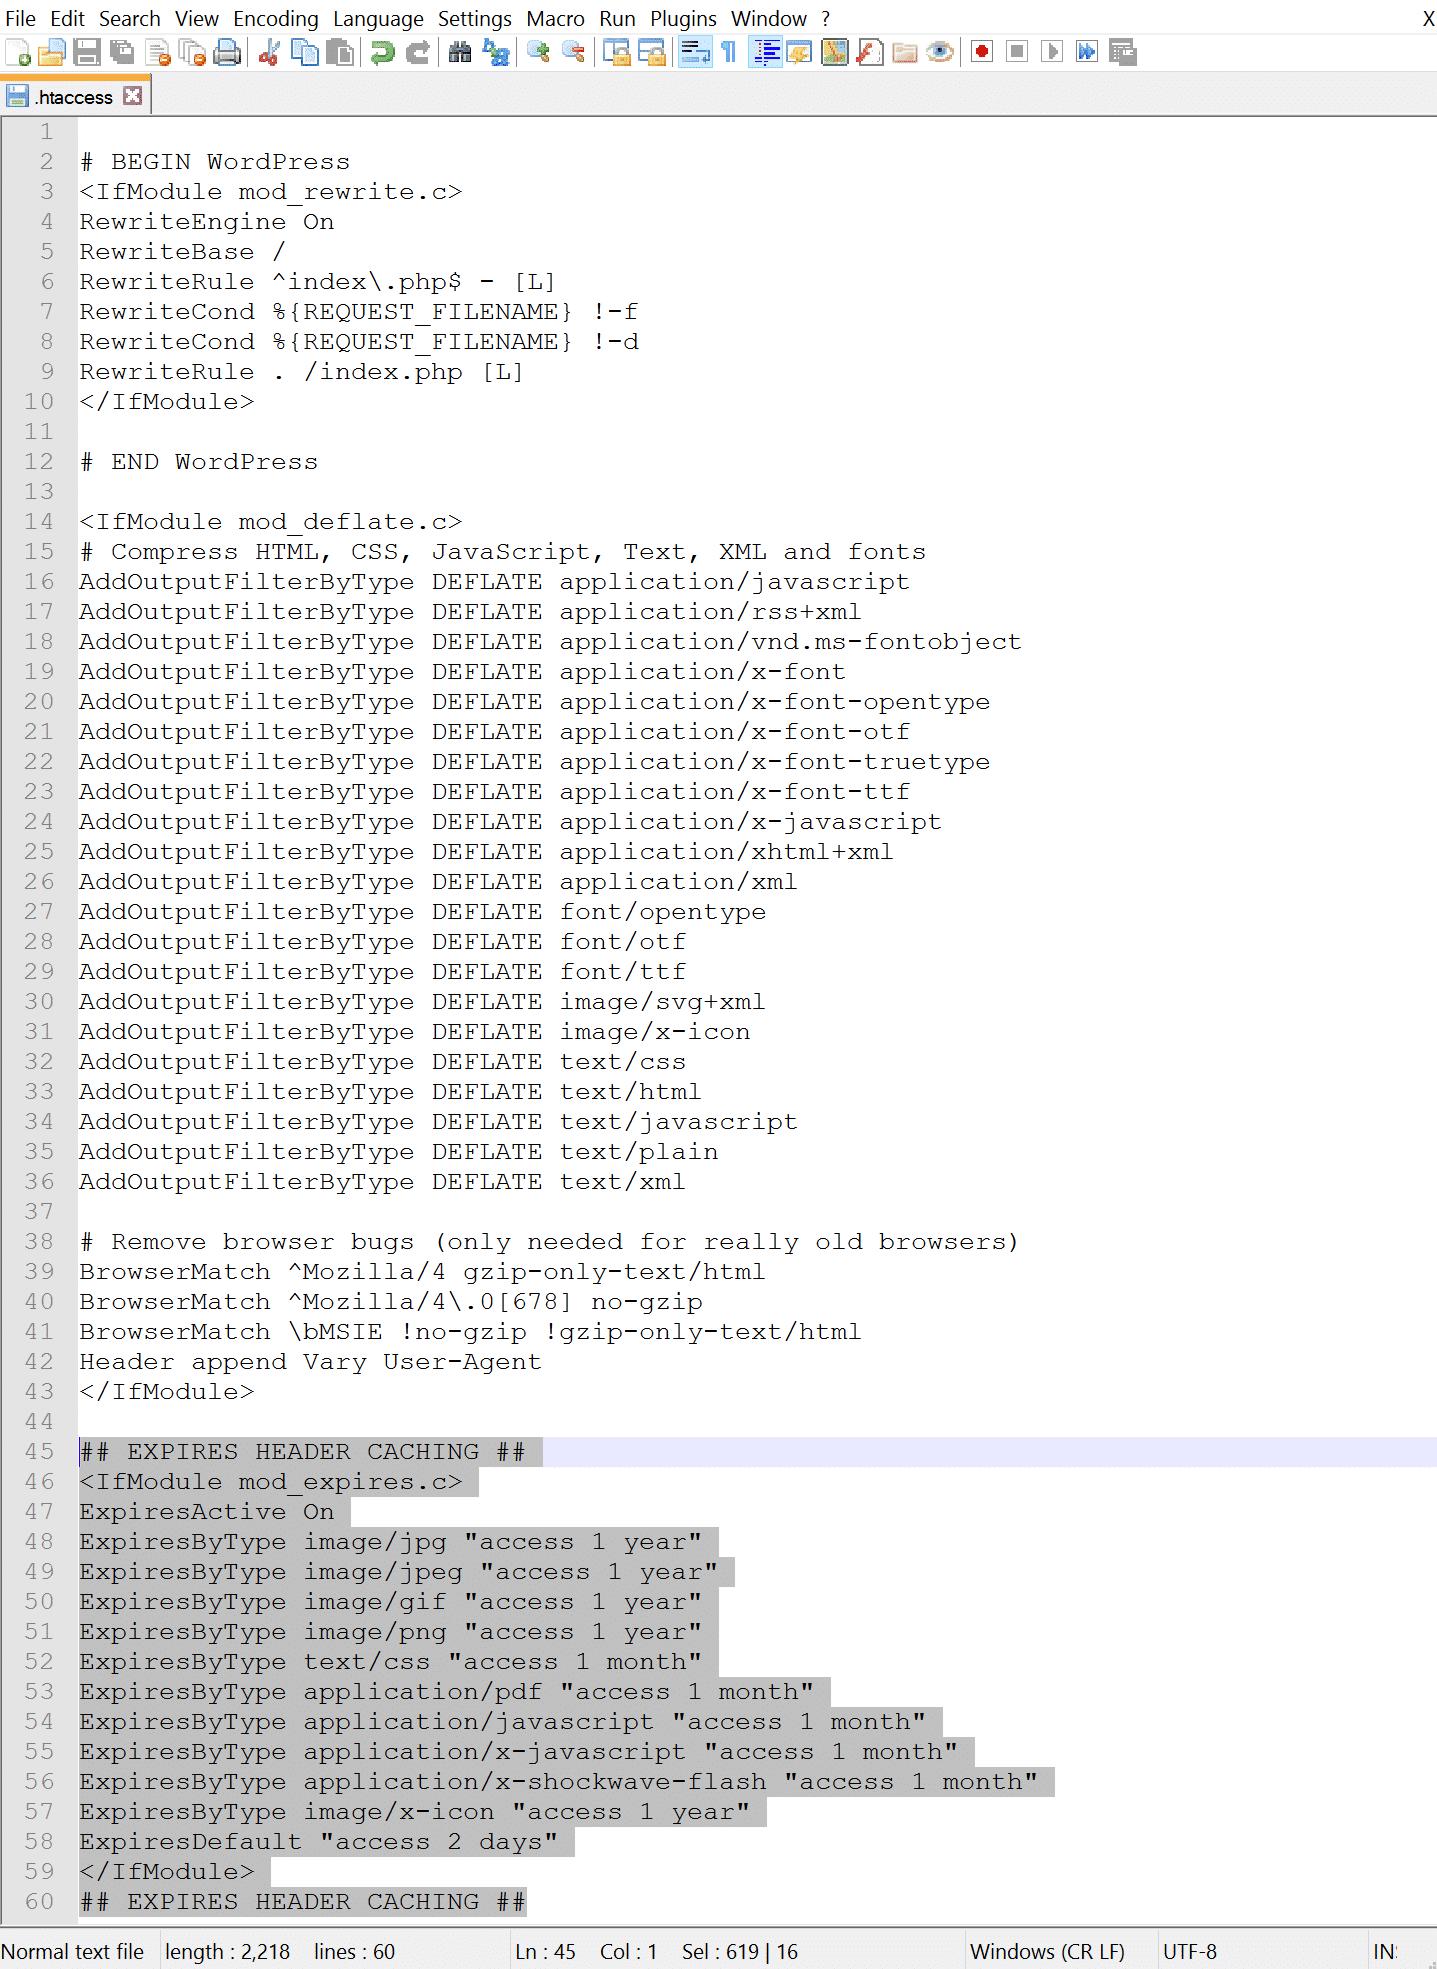 Expire headers code